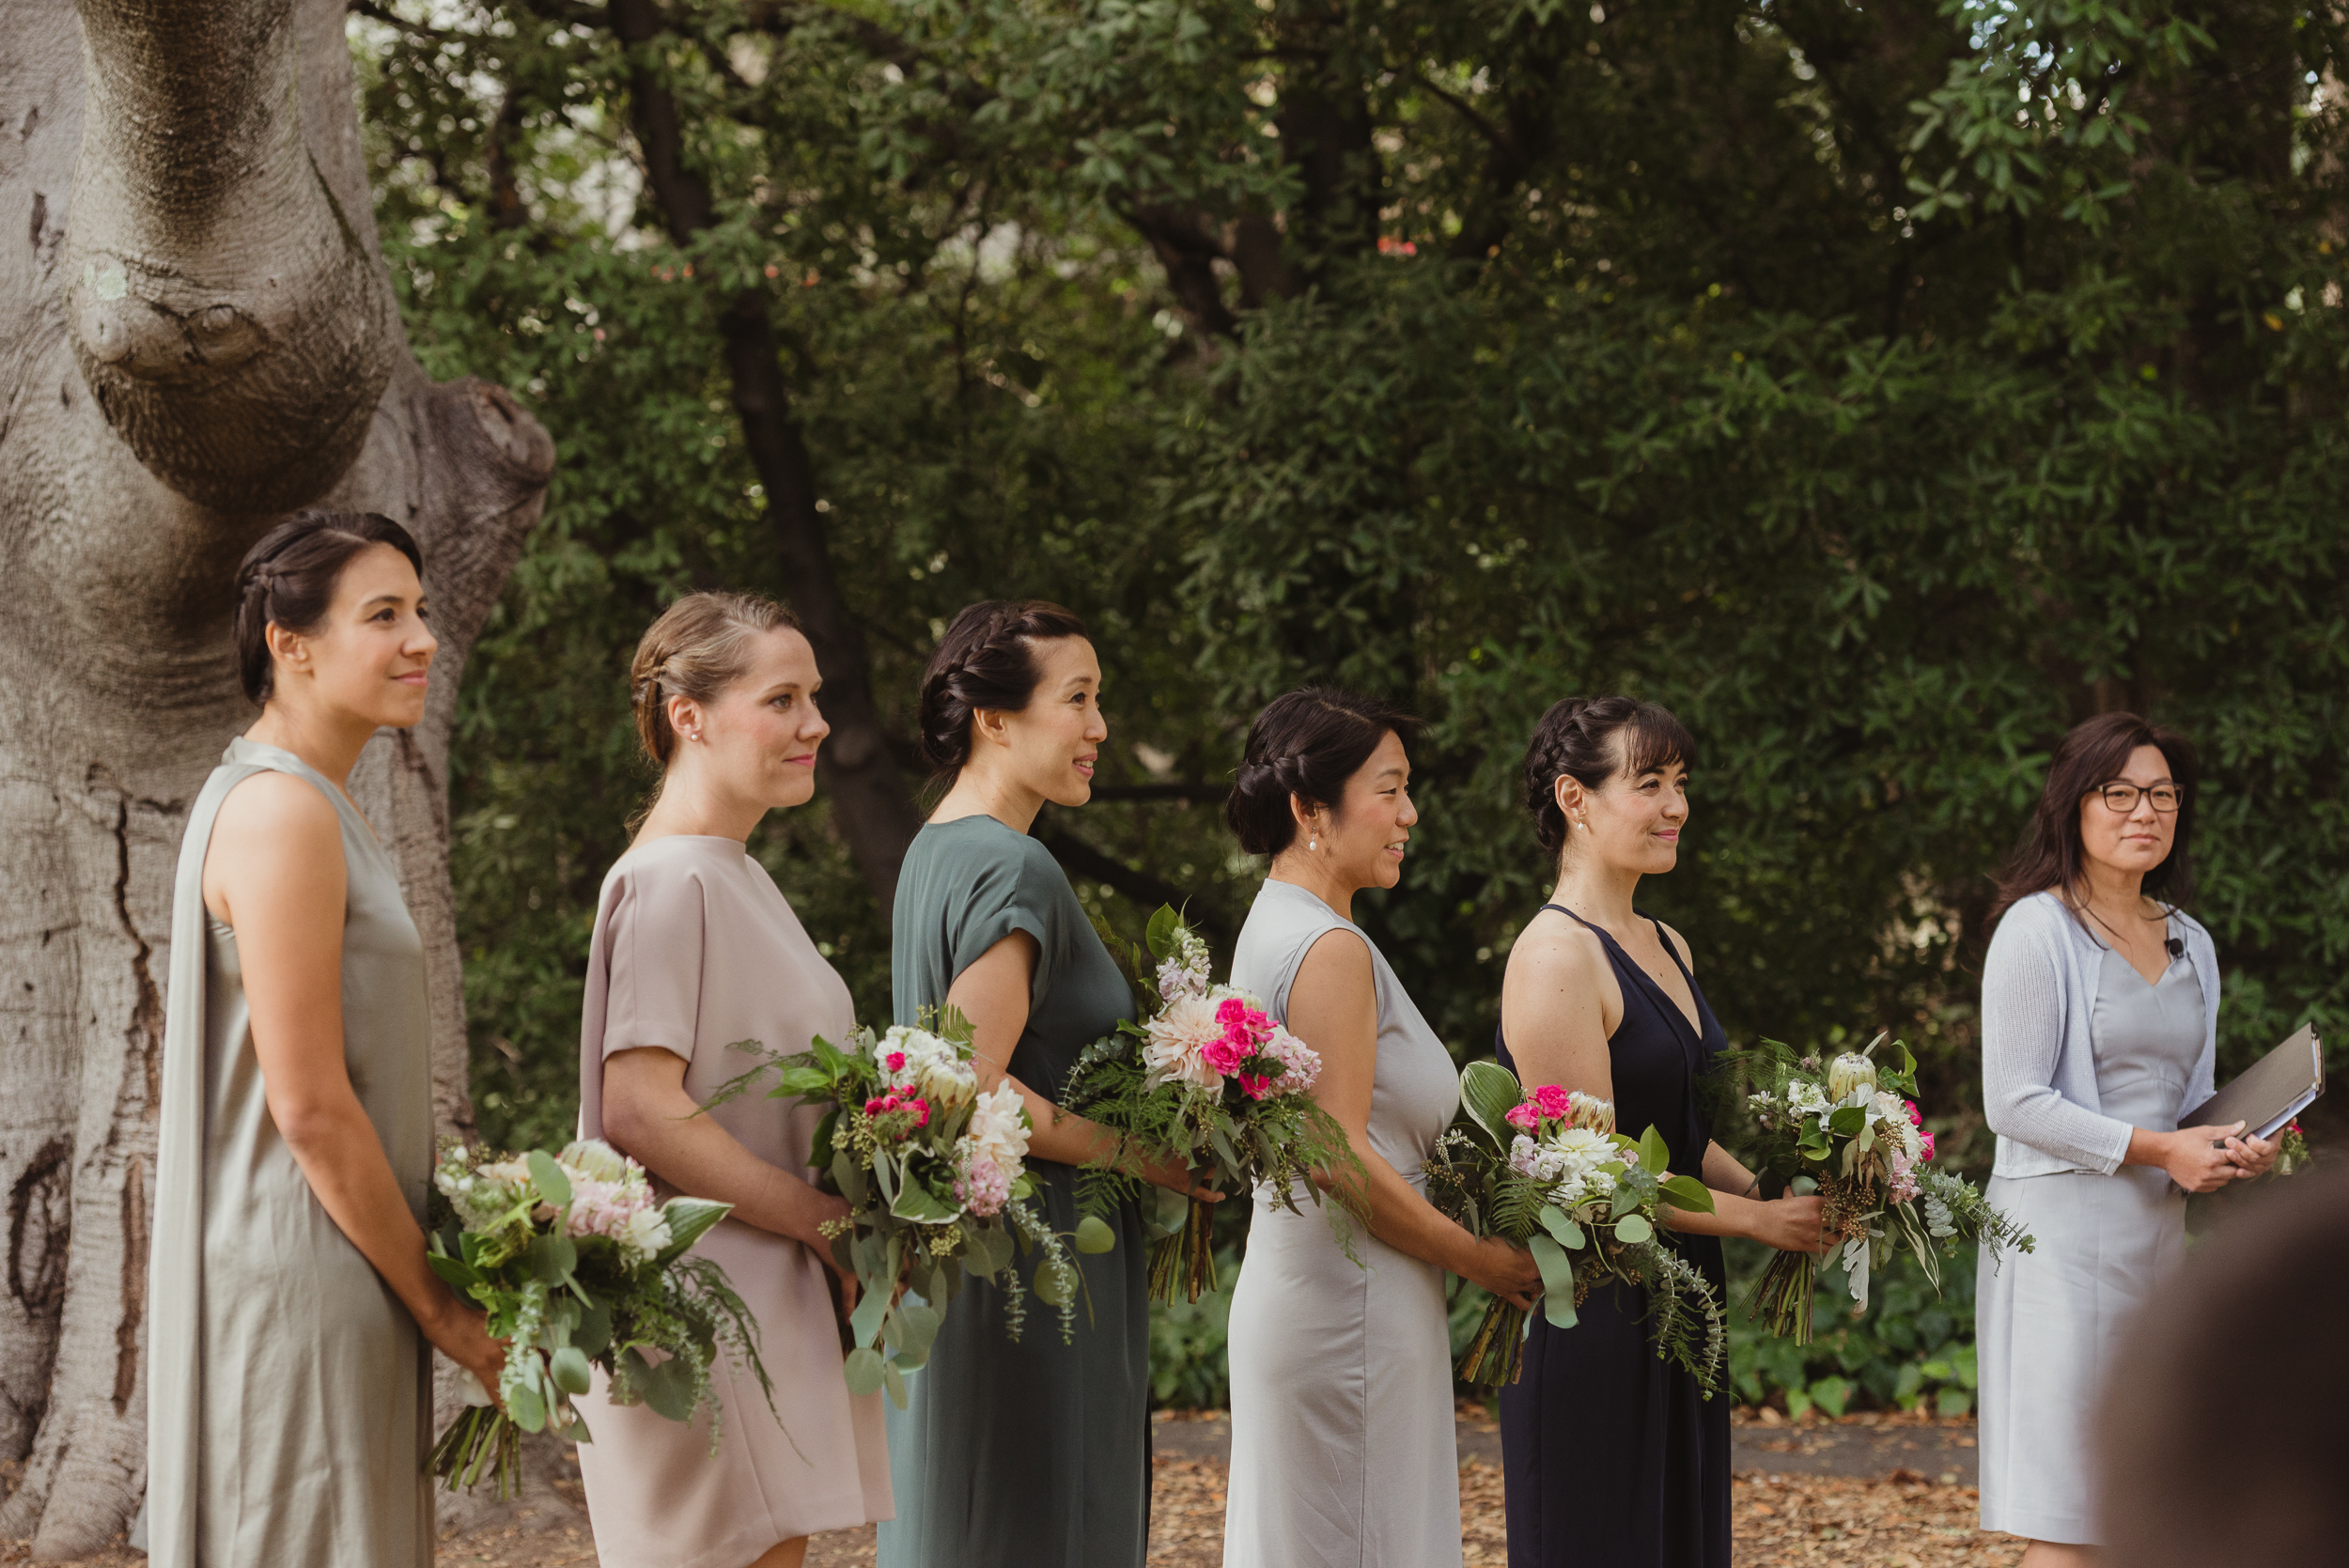 faculty-club-berkeley-wedding-photographer-vc028.jpg